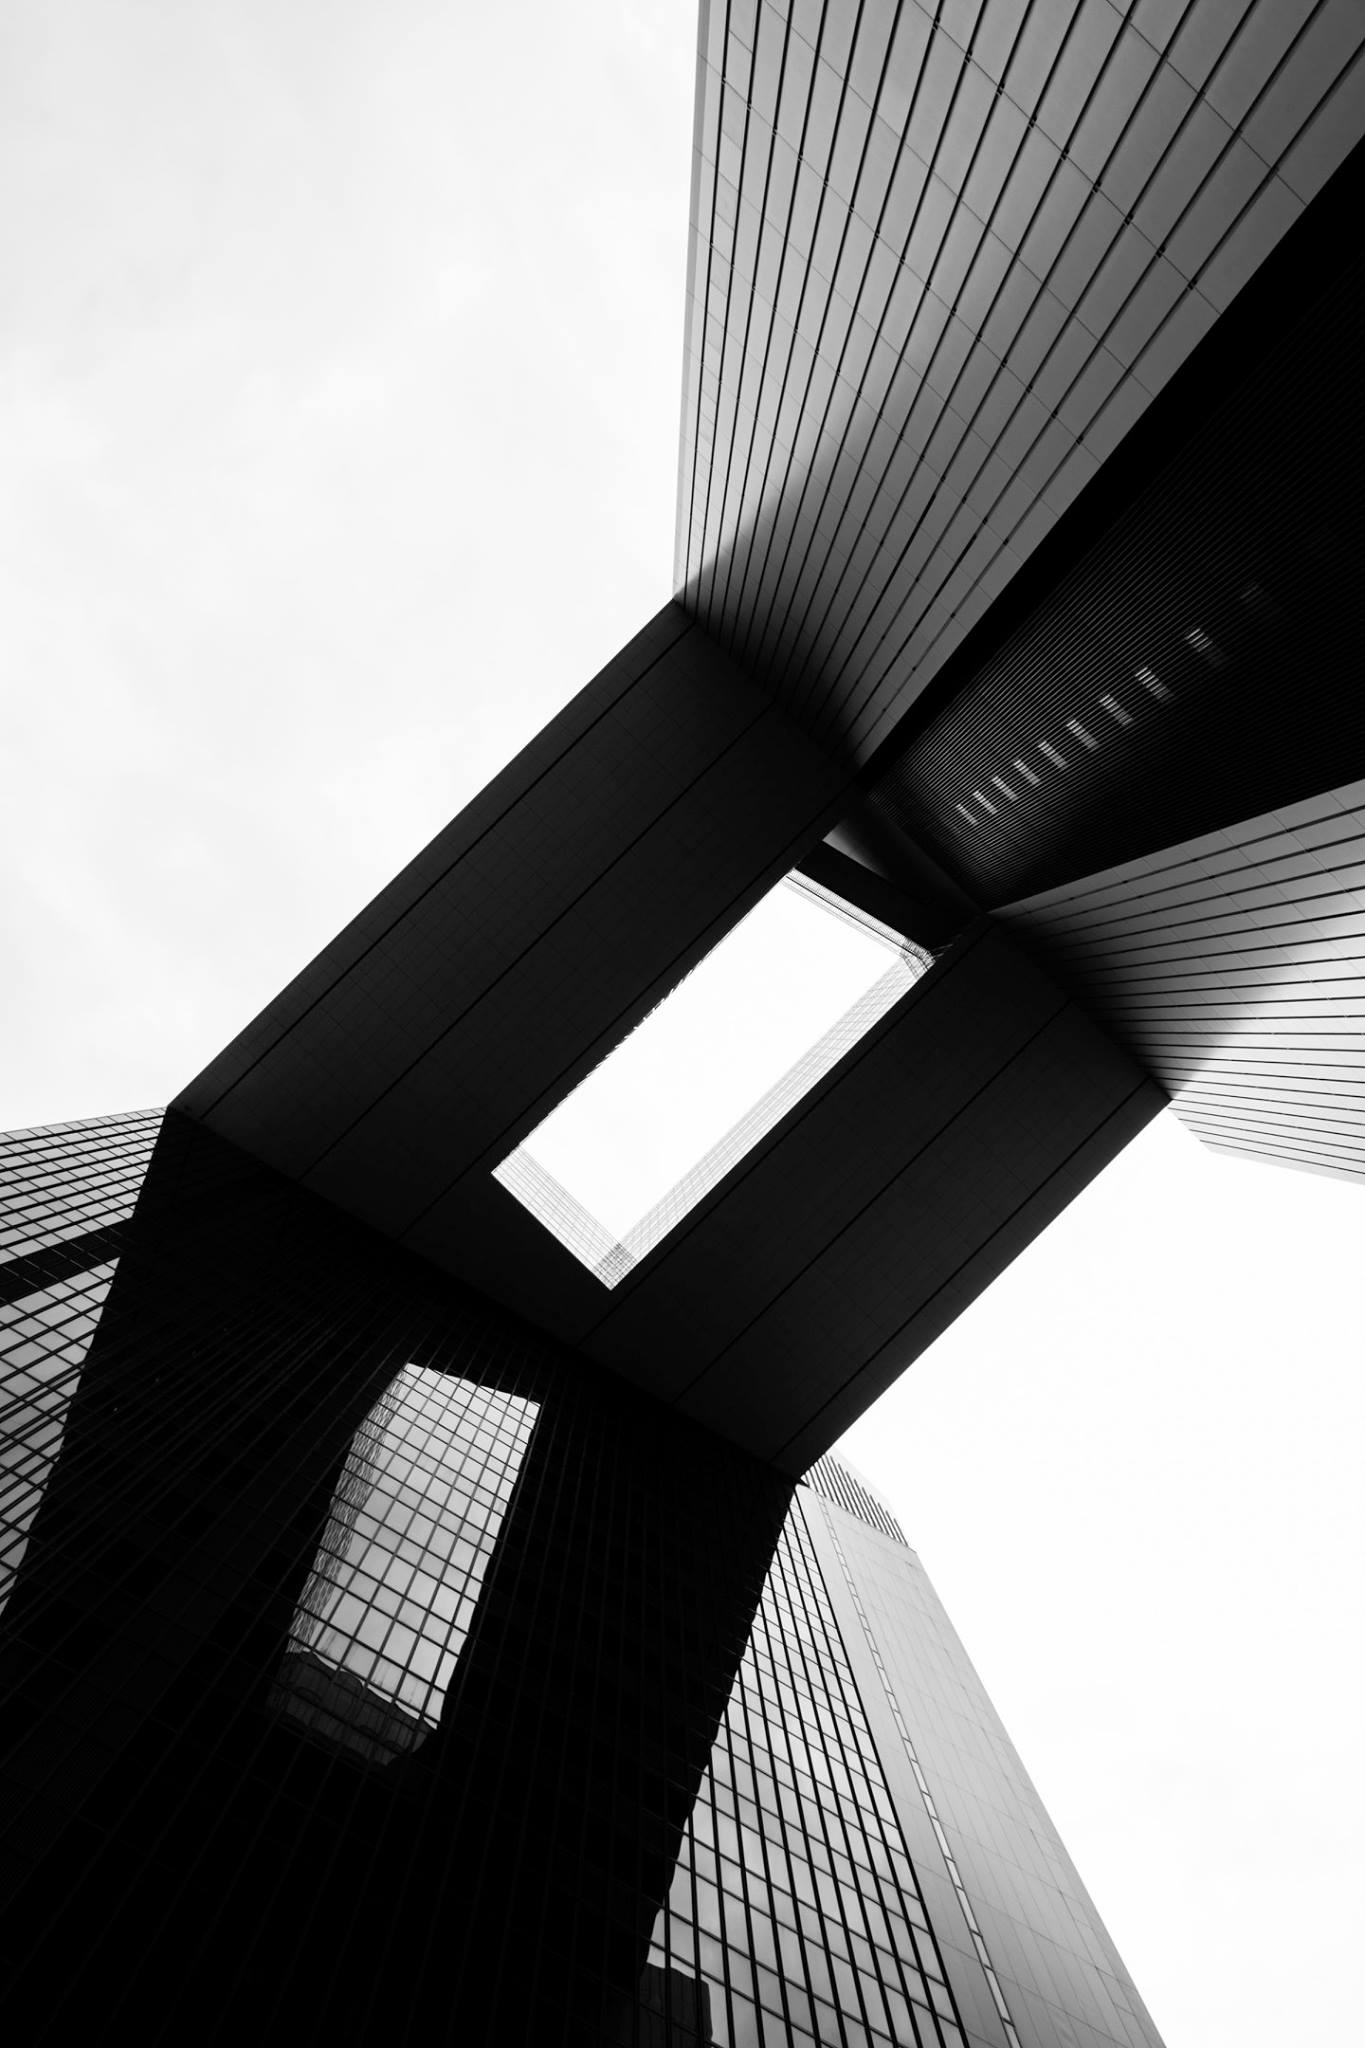 kevin-krautgartner-architecture-photography-08